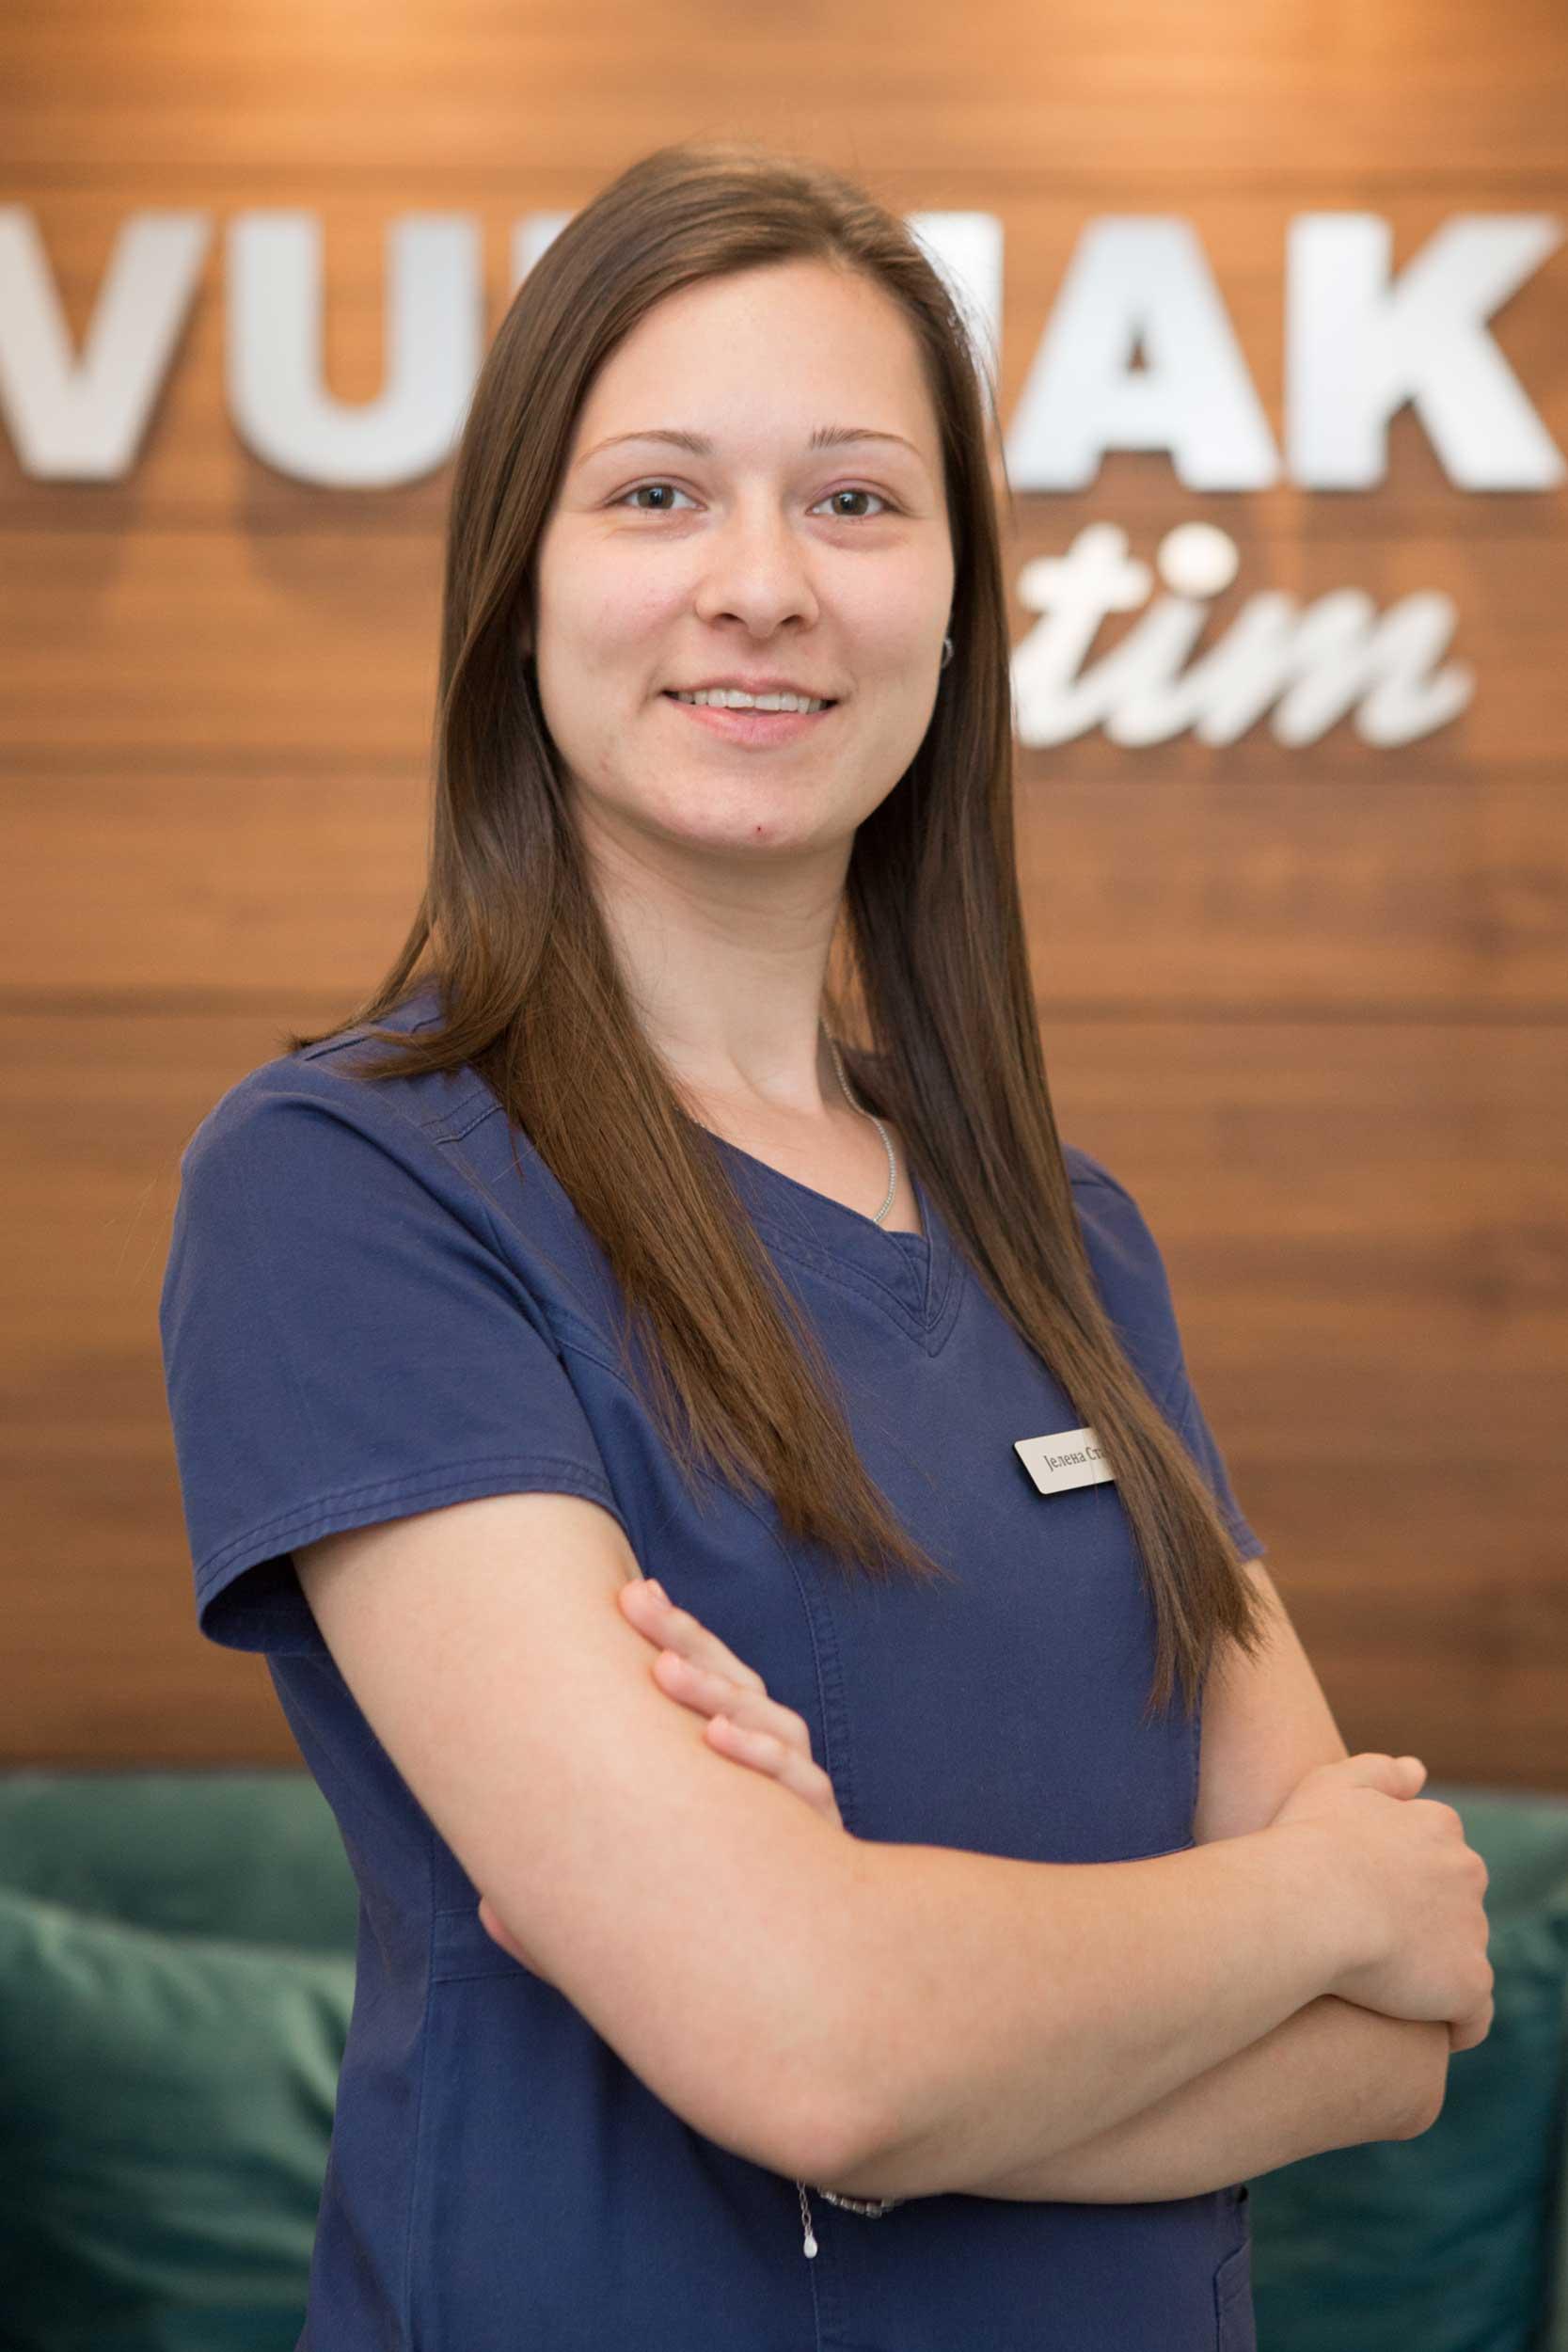 stomatoloska-ordinacija-vunjak-tim-stomatoloska-sestra-jelena-stankic